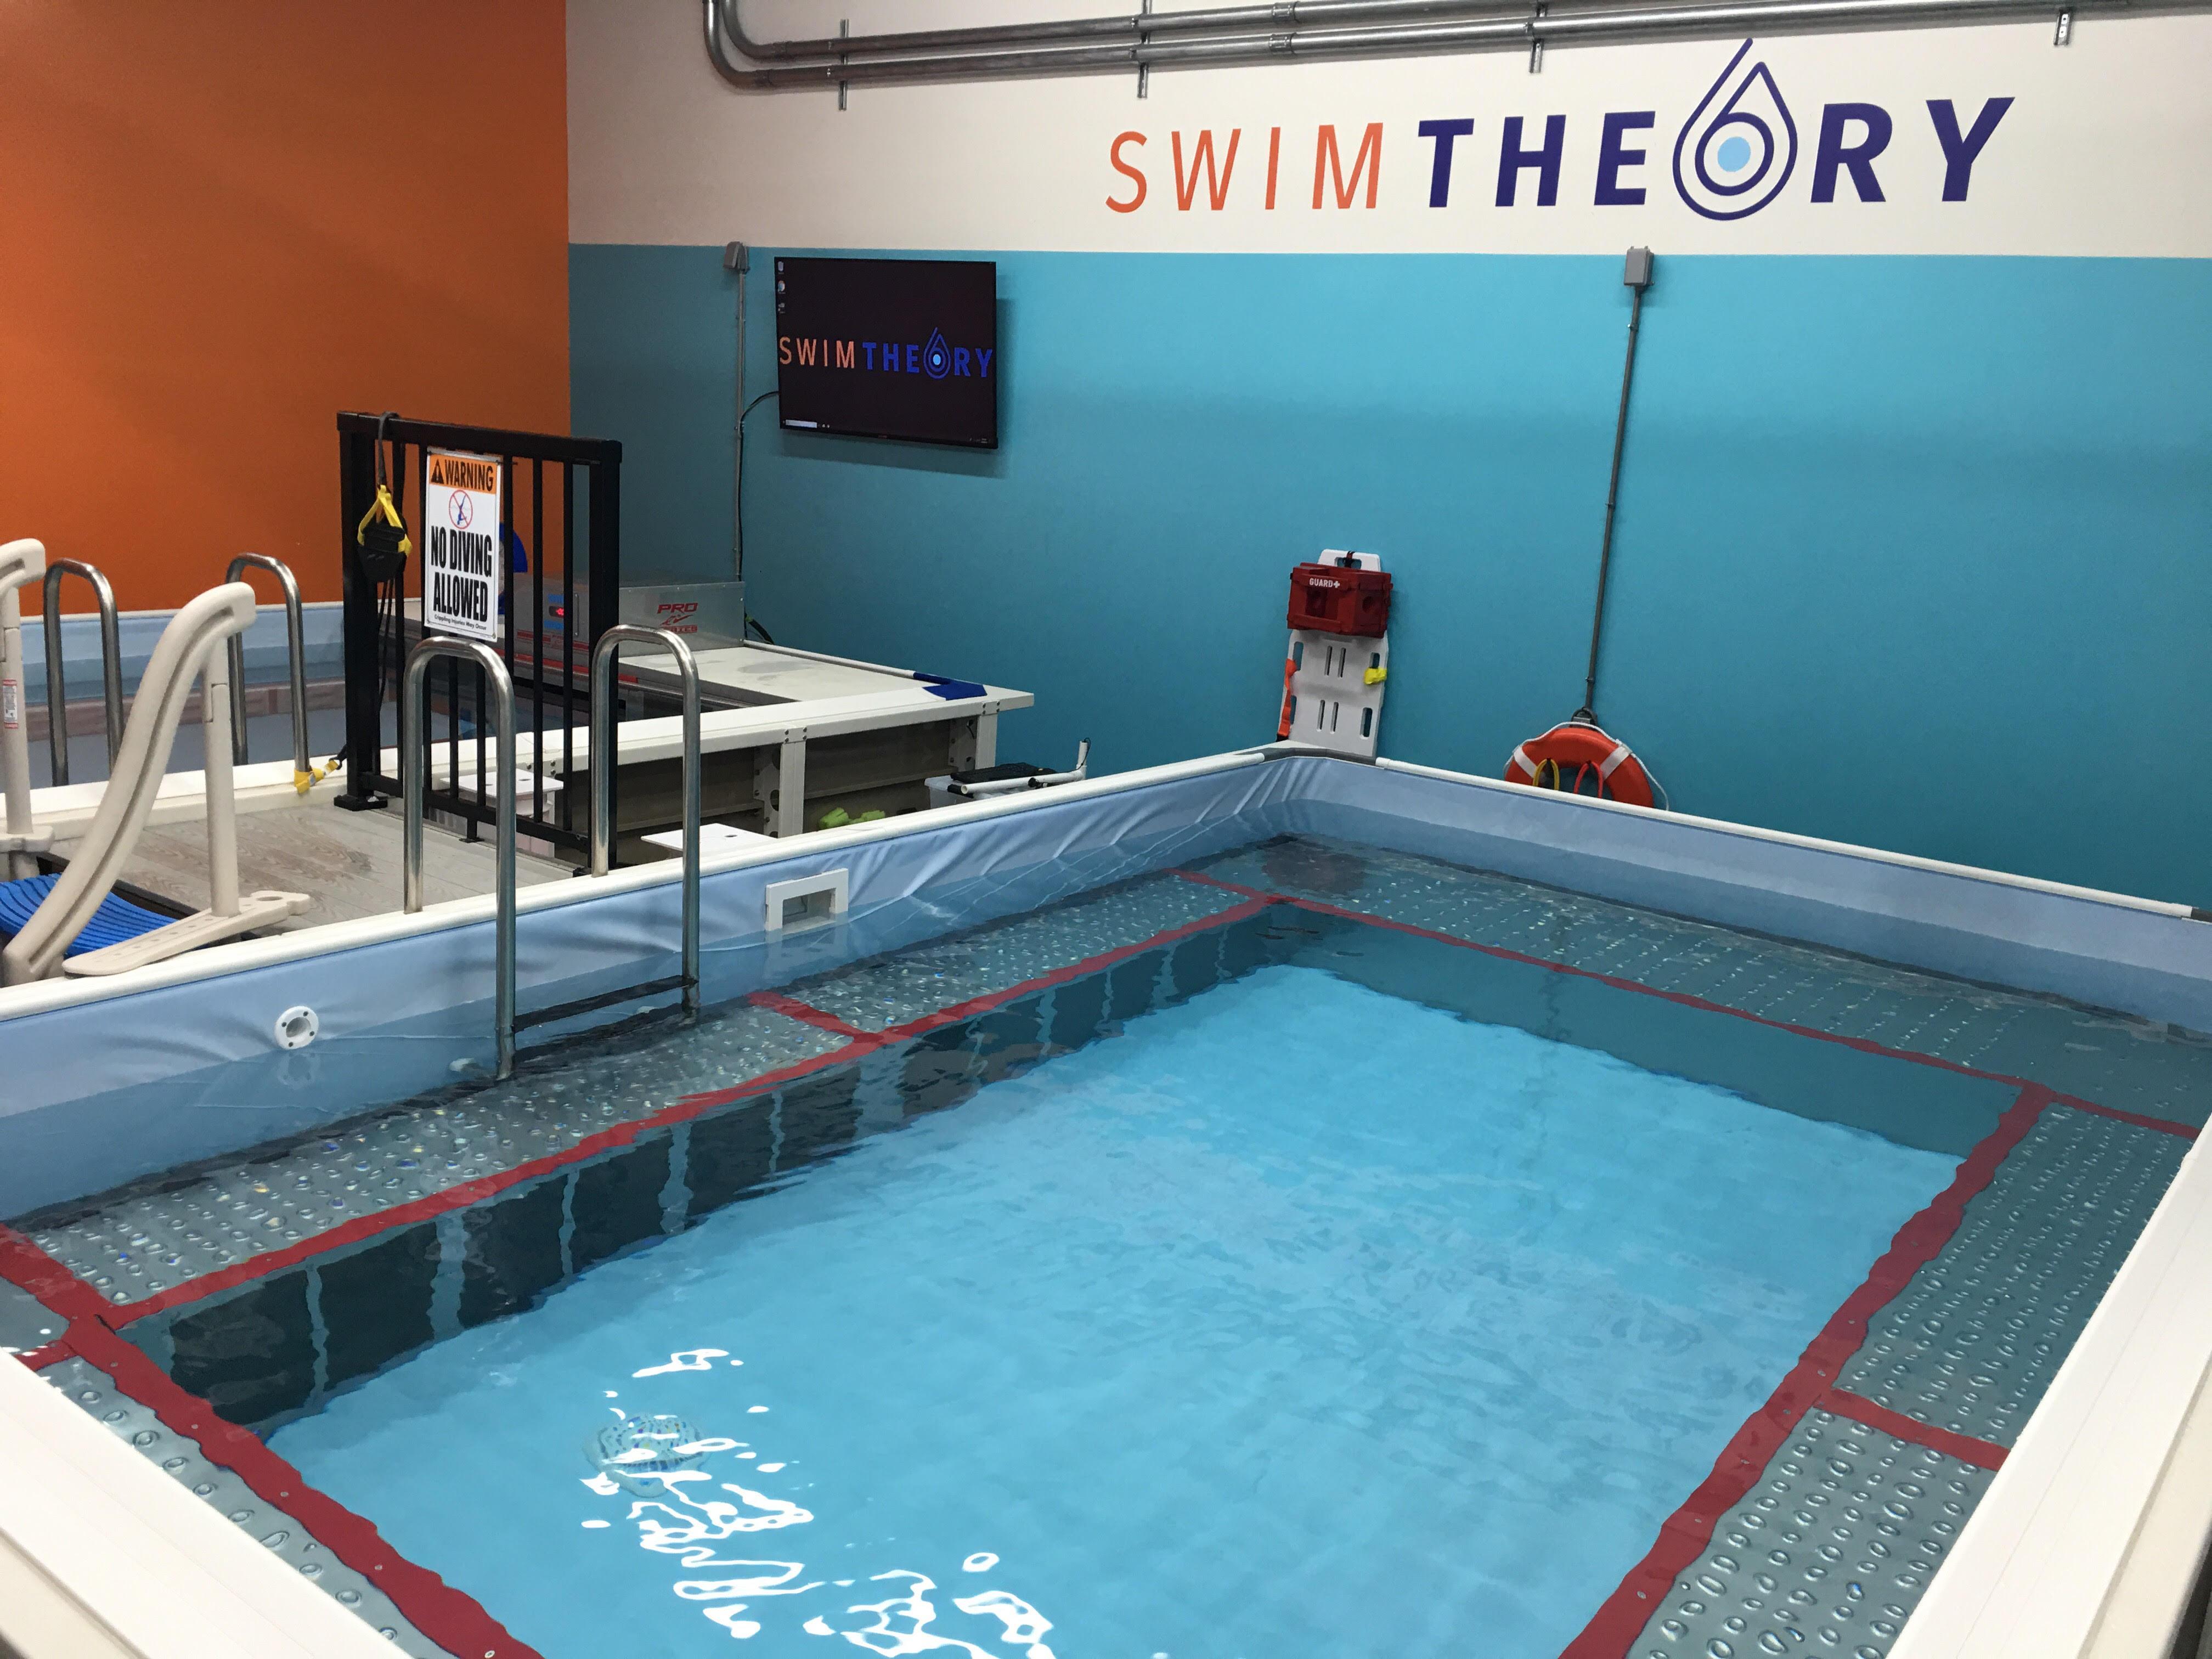 Swim Theory image 0